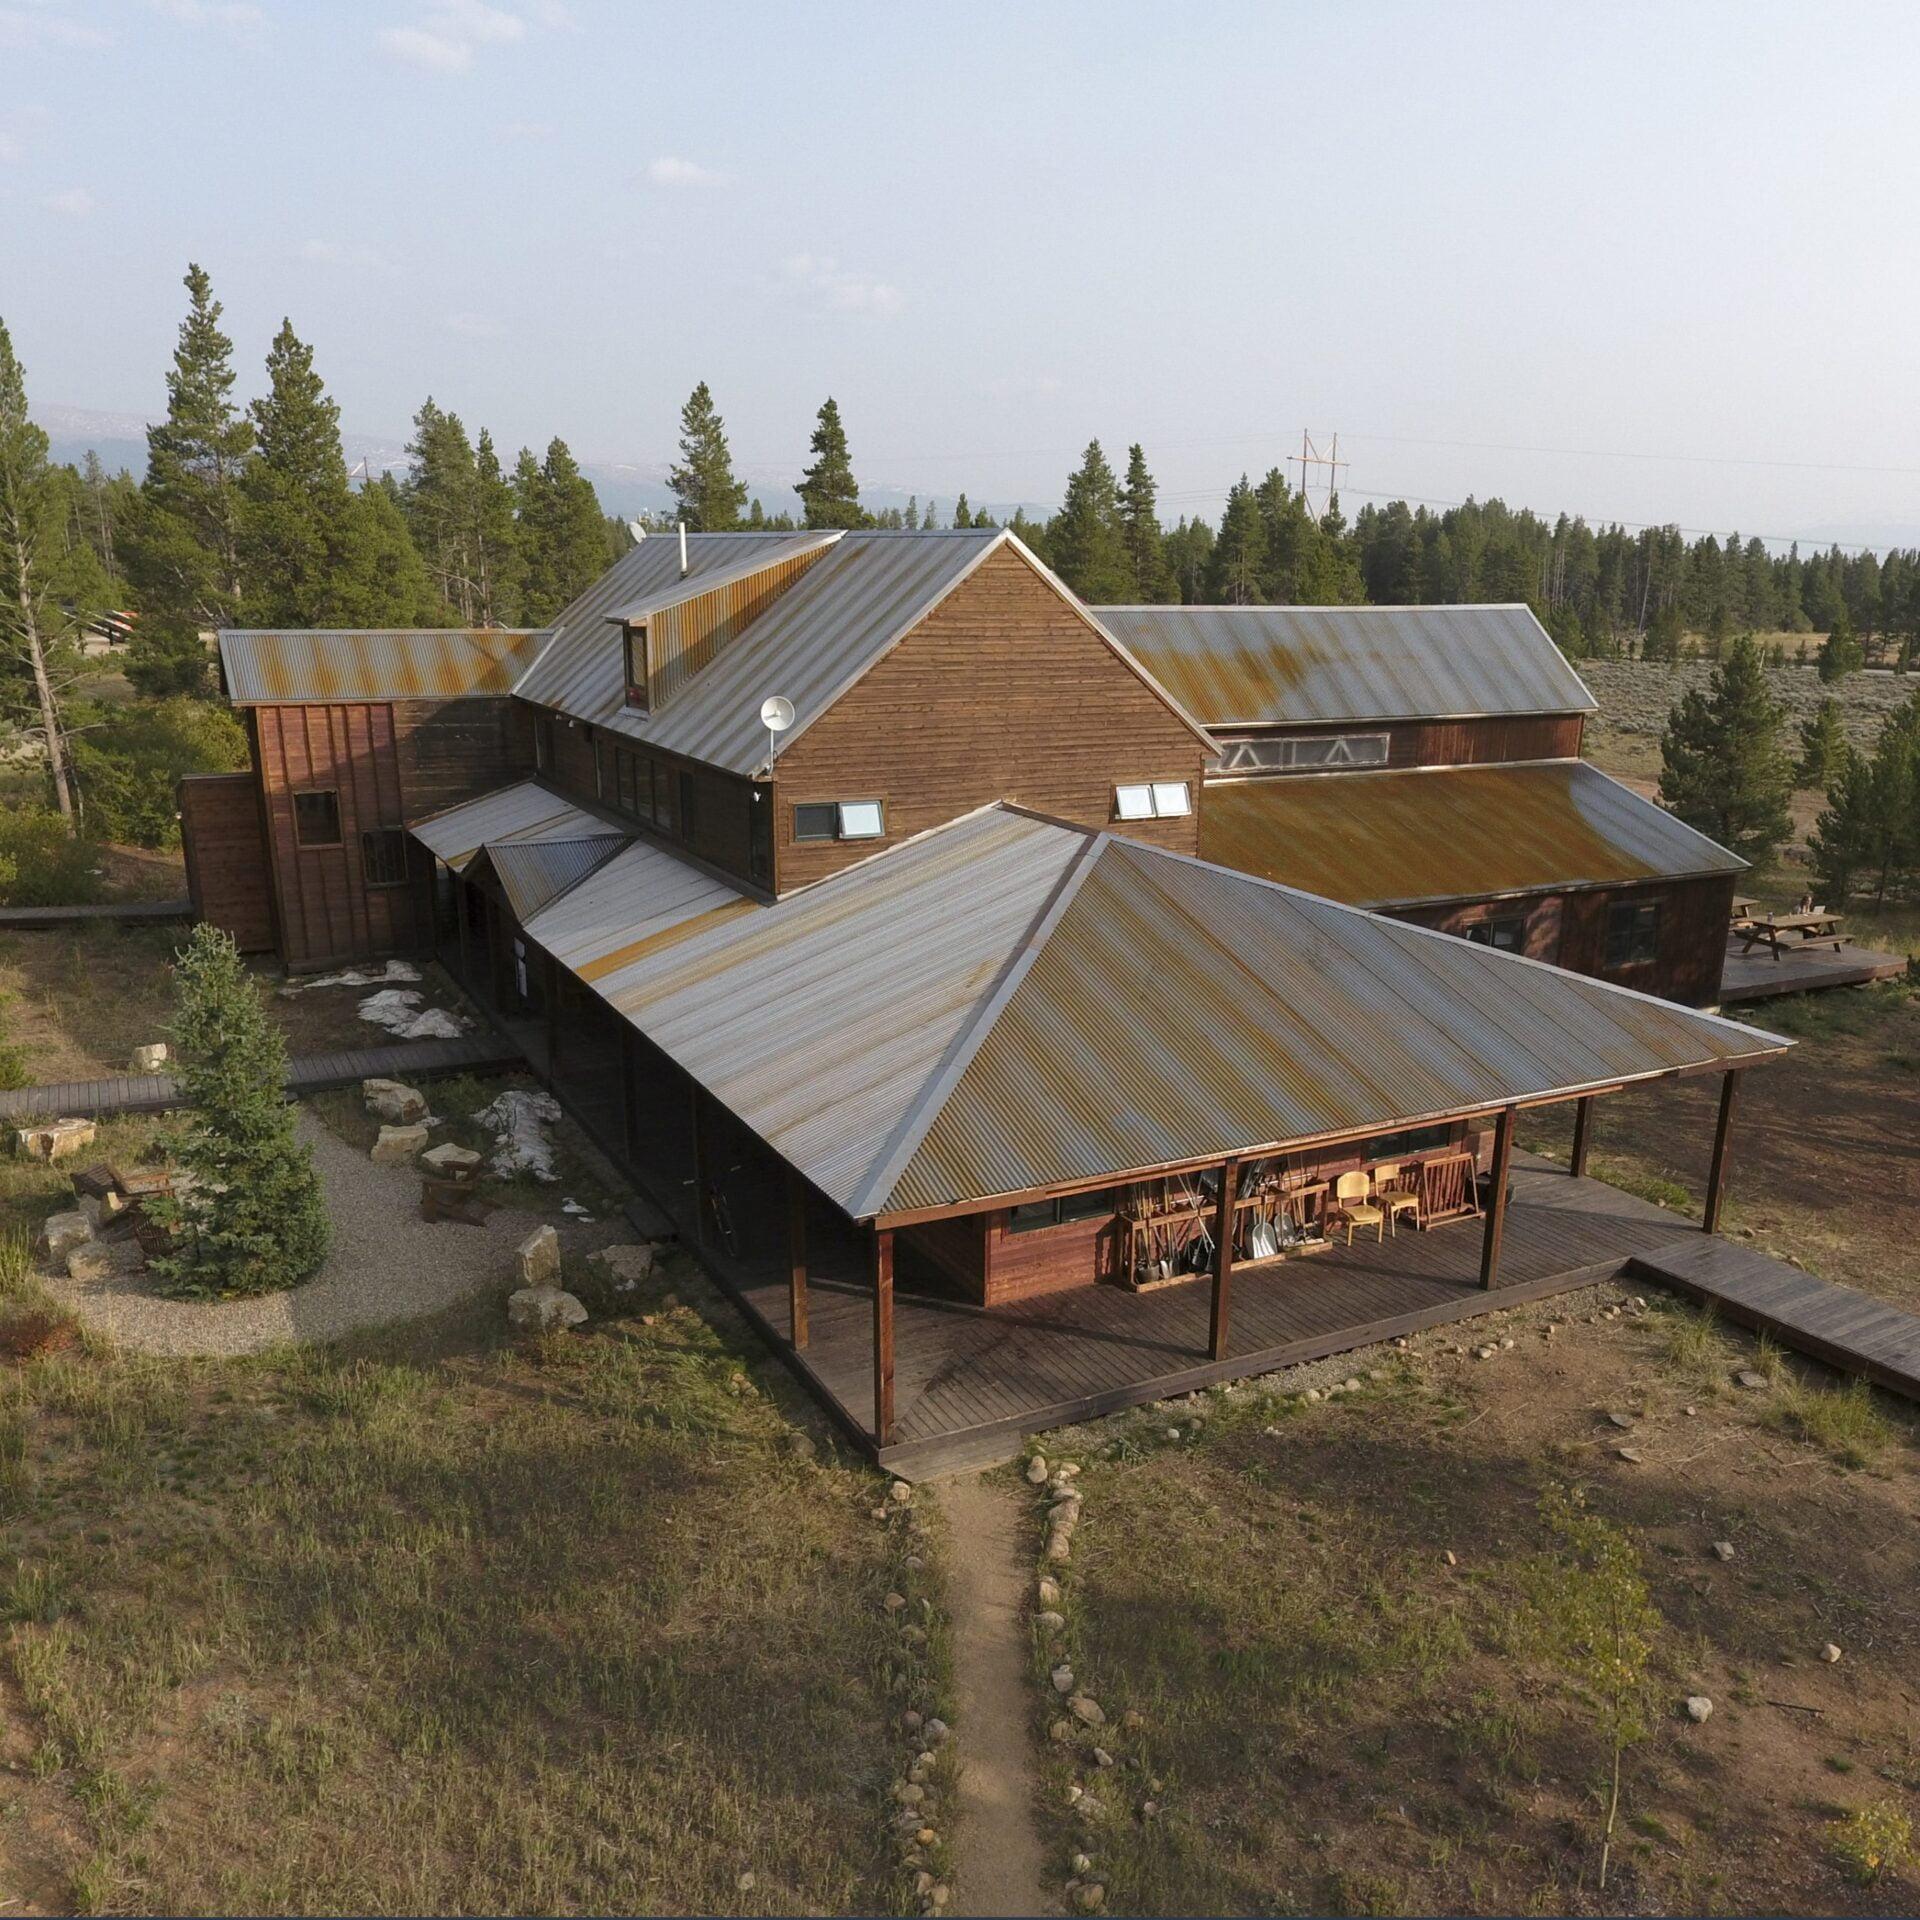 Image shot at BMI Institute, Leadville, Colorado, Completed Sheet Metal Project, Drone Shots, September 17, 2020, Jeffrey Parr/Supreme Roofing